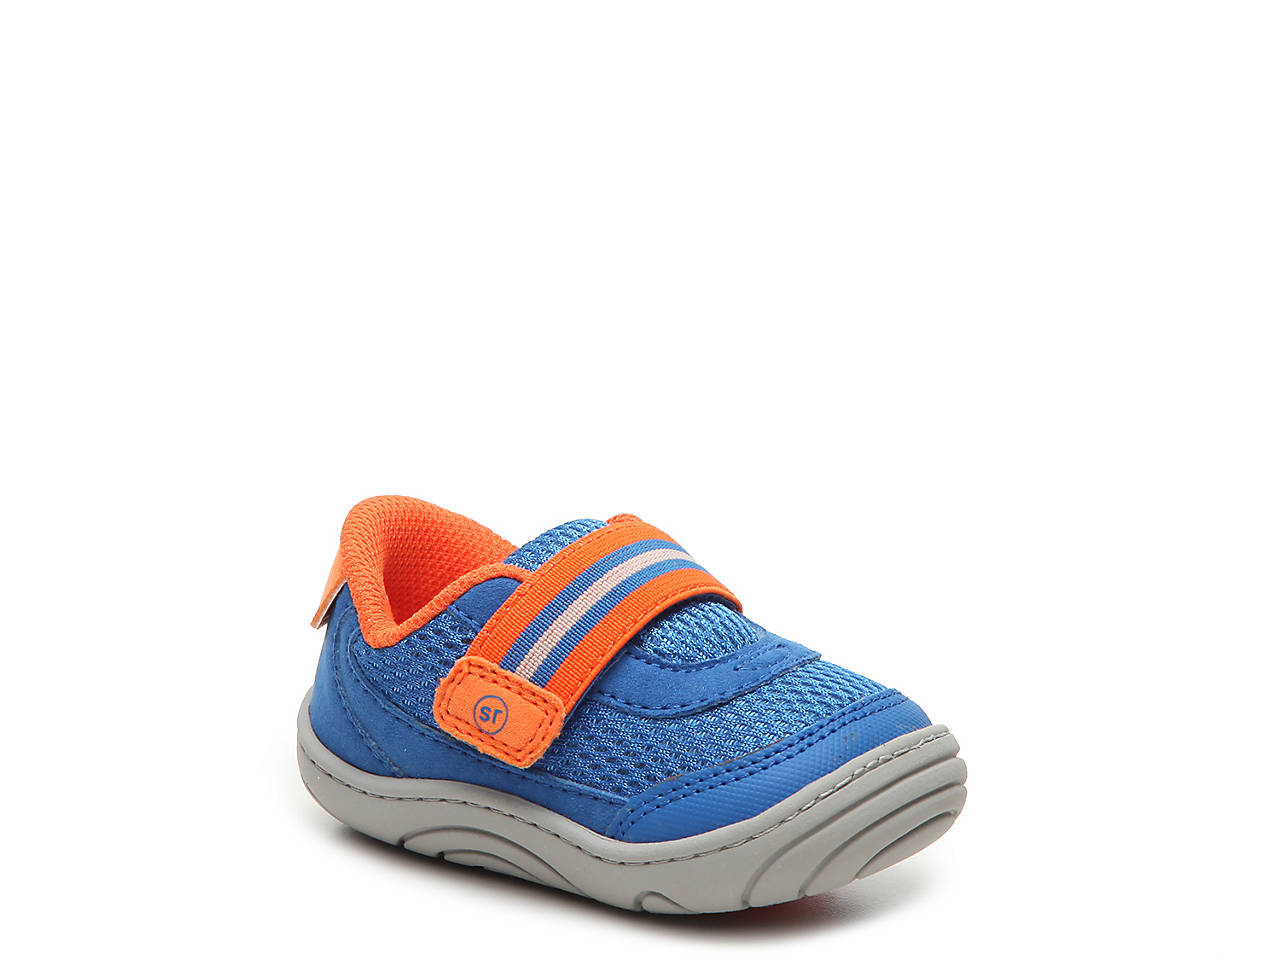 82e2f4d58d Stride Rite Jessie Infant   Toddler Sneaker Kids Shoes